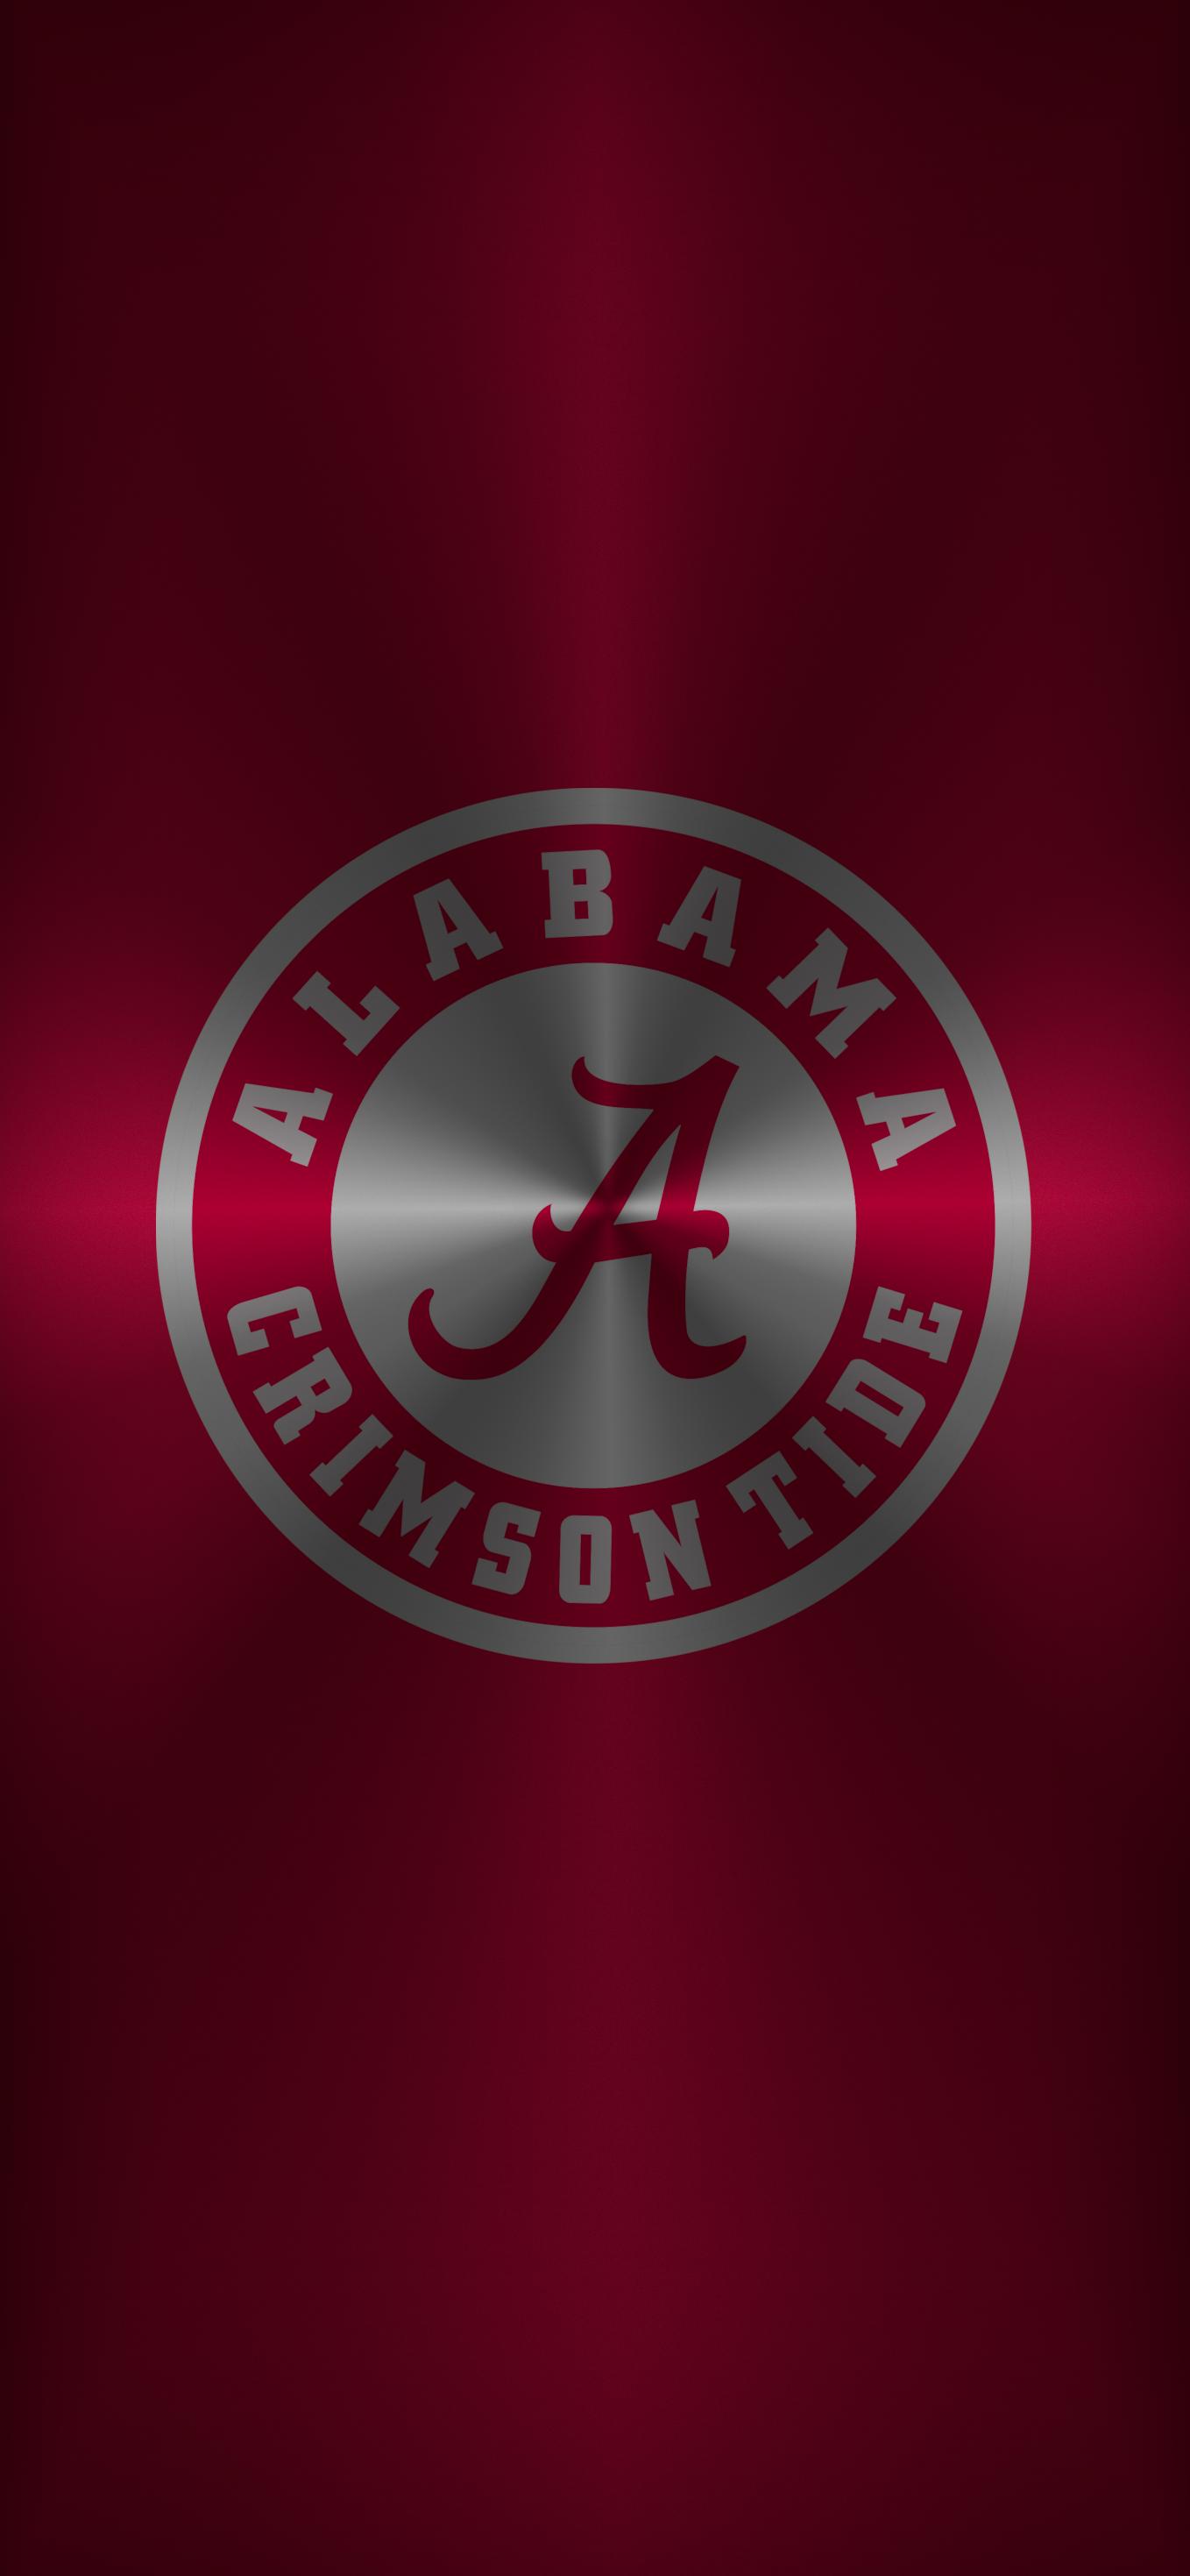 Bama Logo 14 Metal Alabama Crimson Tide Football Wallpaper Alabama Crimson Tide Logo Alabama Crimson Tide